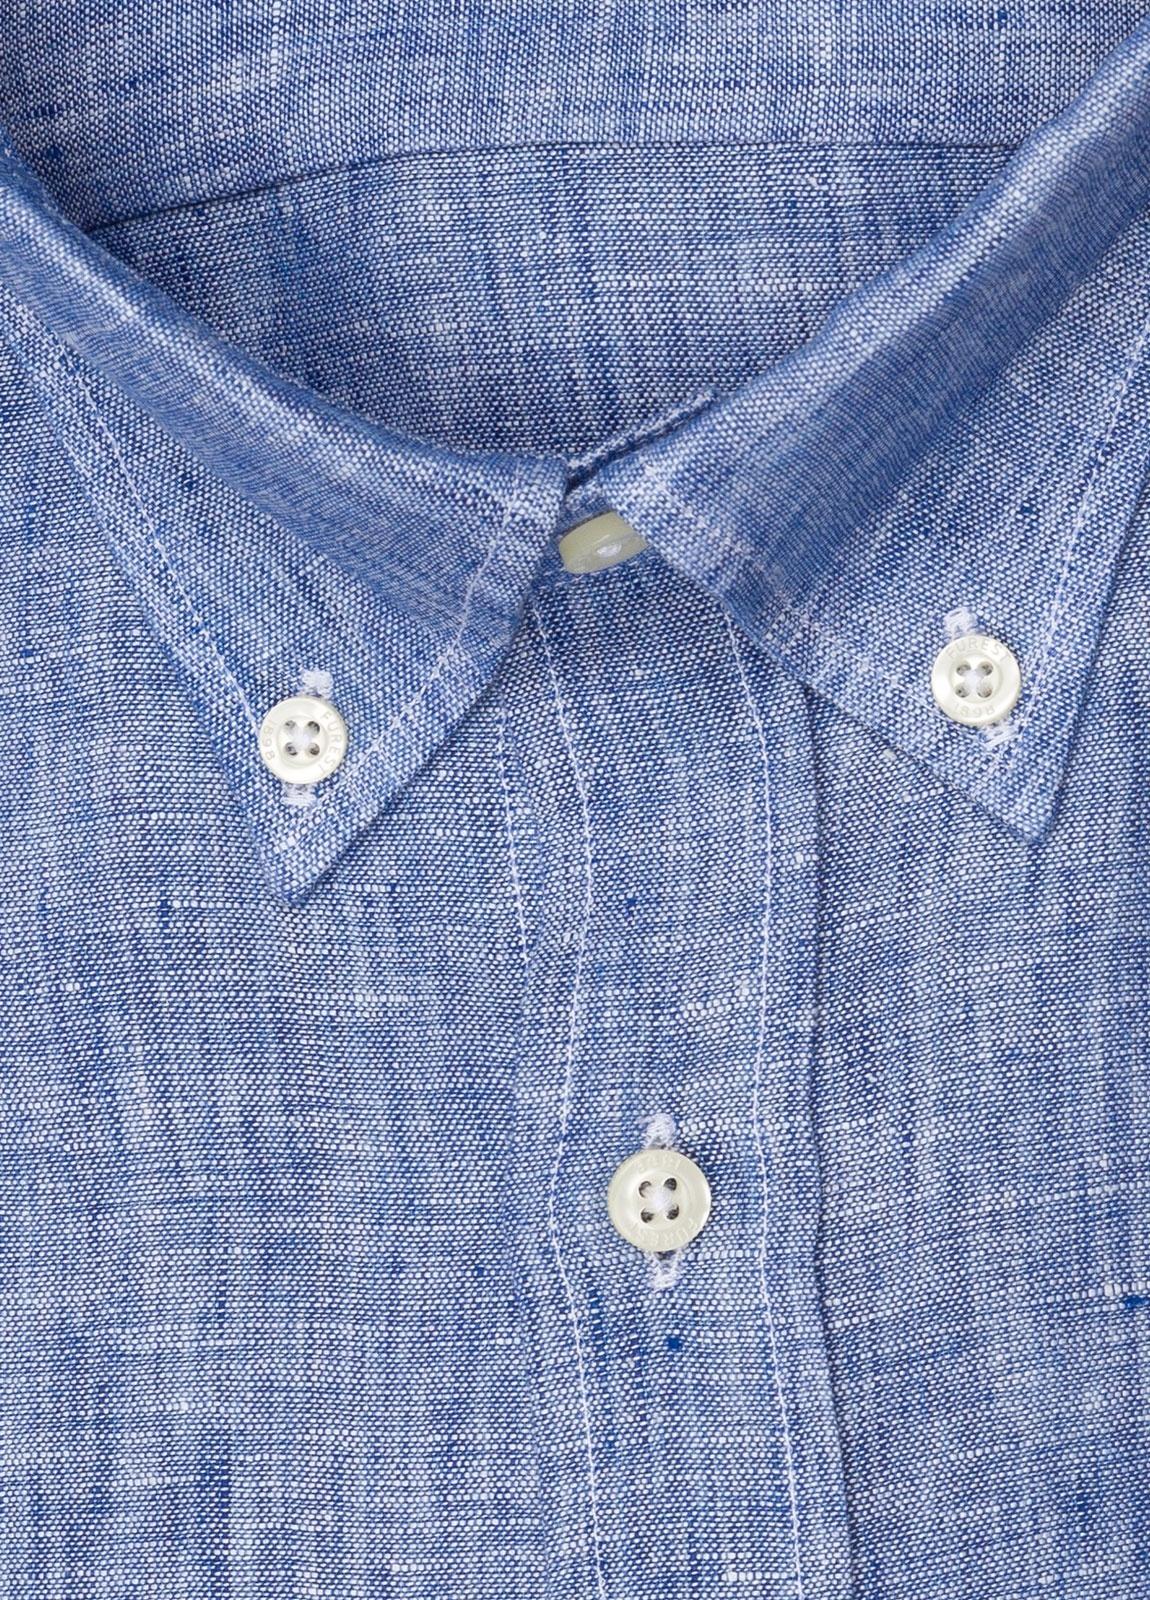 Camisa sport FUREST COLECCIÓN REGULAR FIT Lino azul - Ítem1